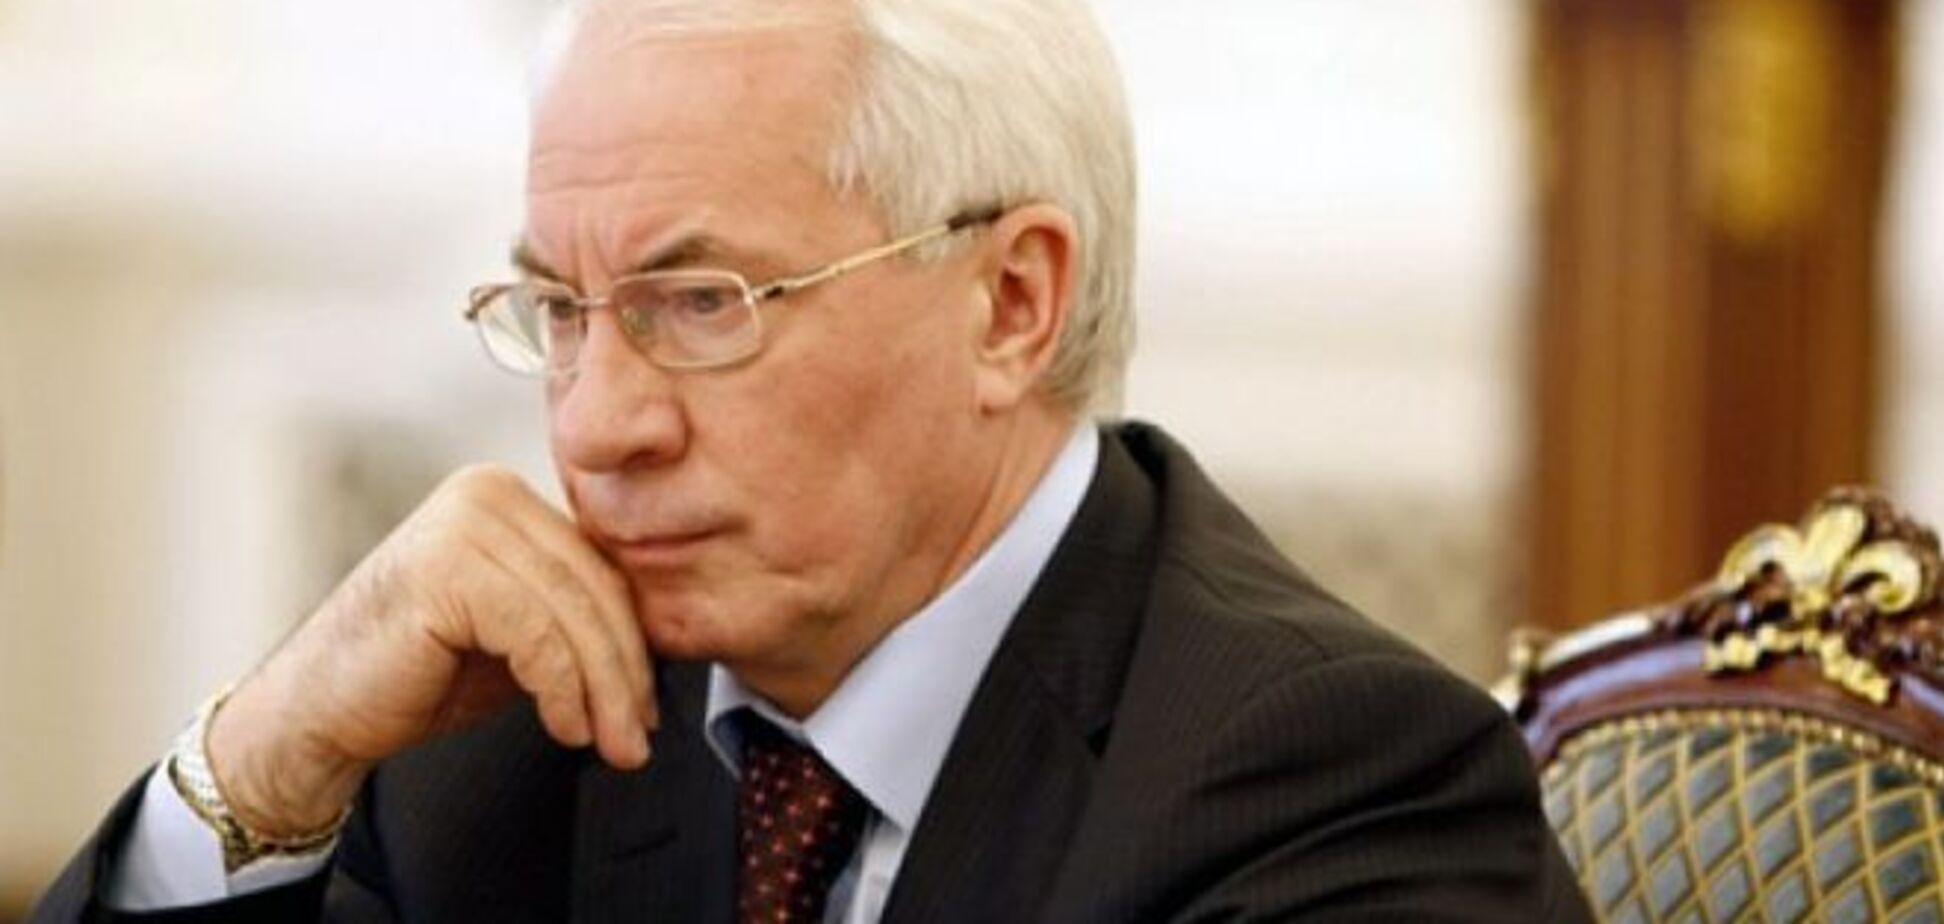 МВД: Азарову незаконно выплатили полмиллиона гривен пенсии